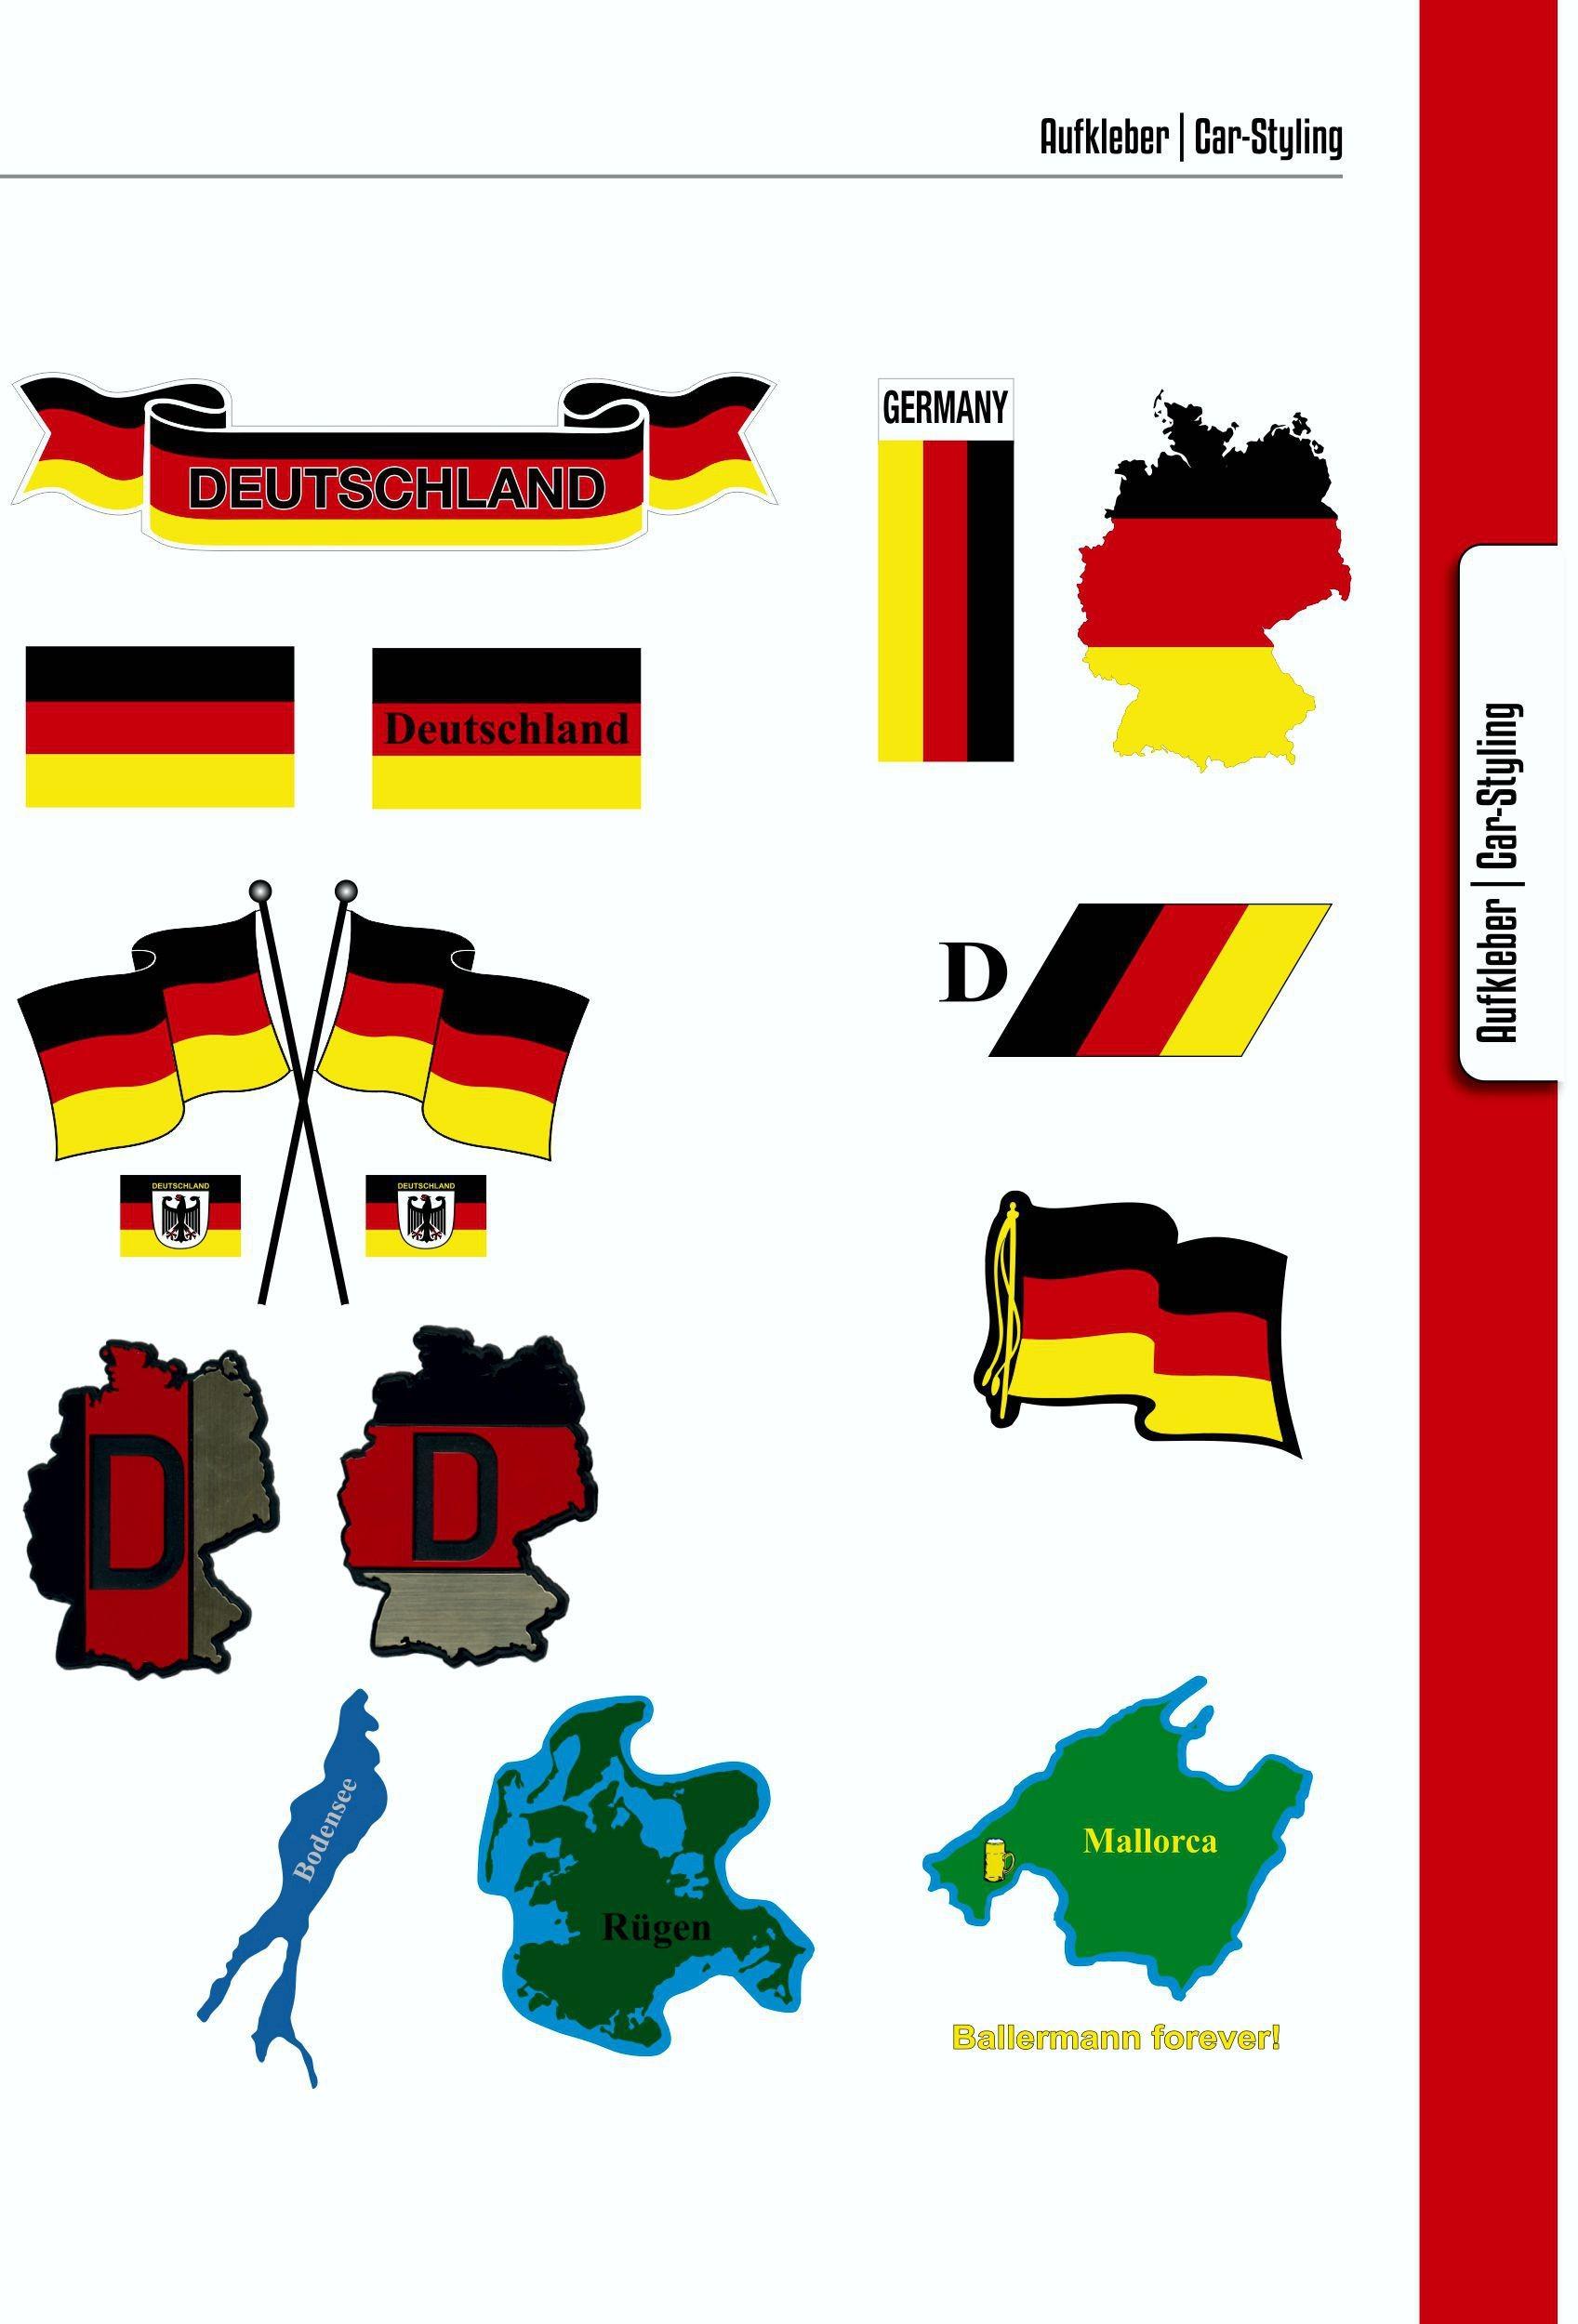 Autocollant amoiries Deutschland 85 x 65 mm – Bild 3